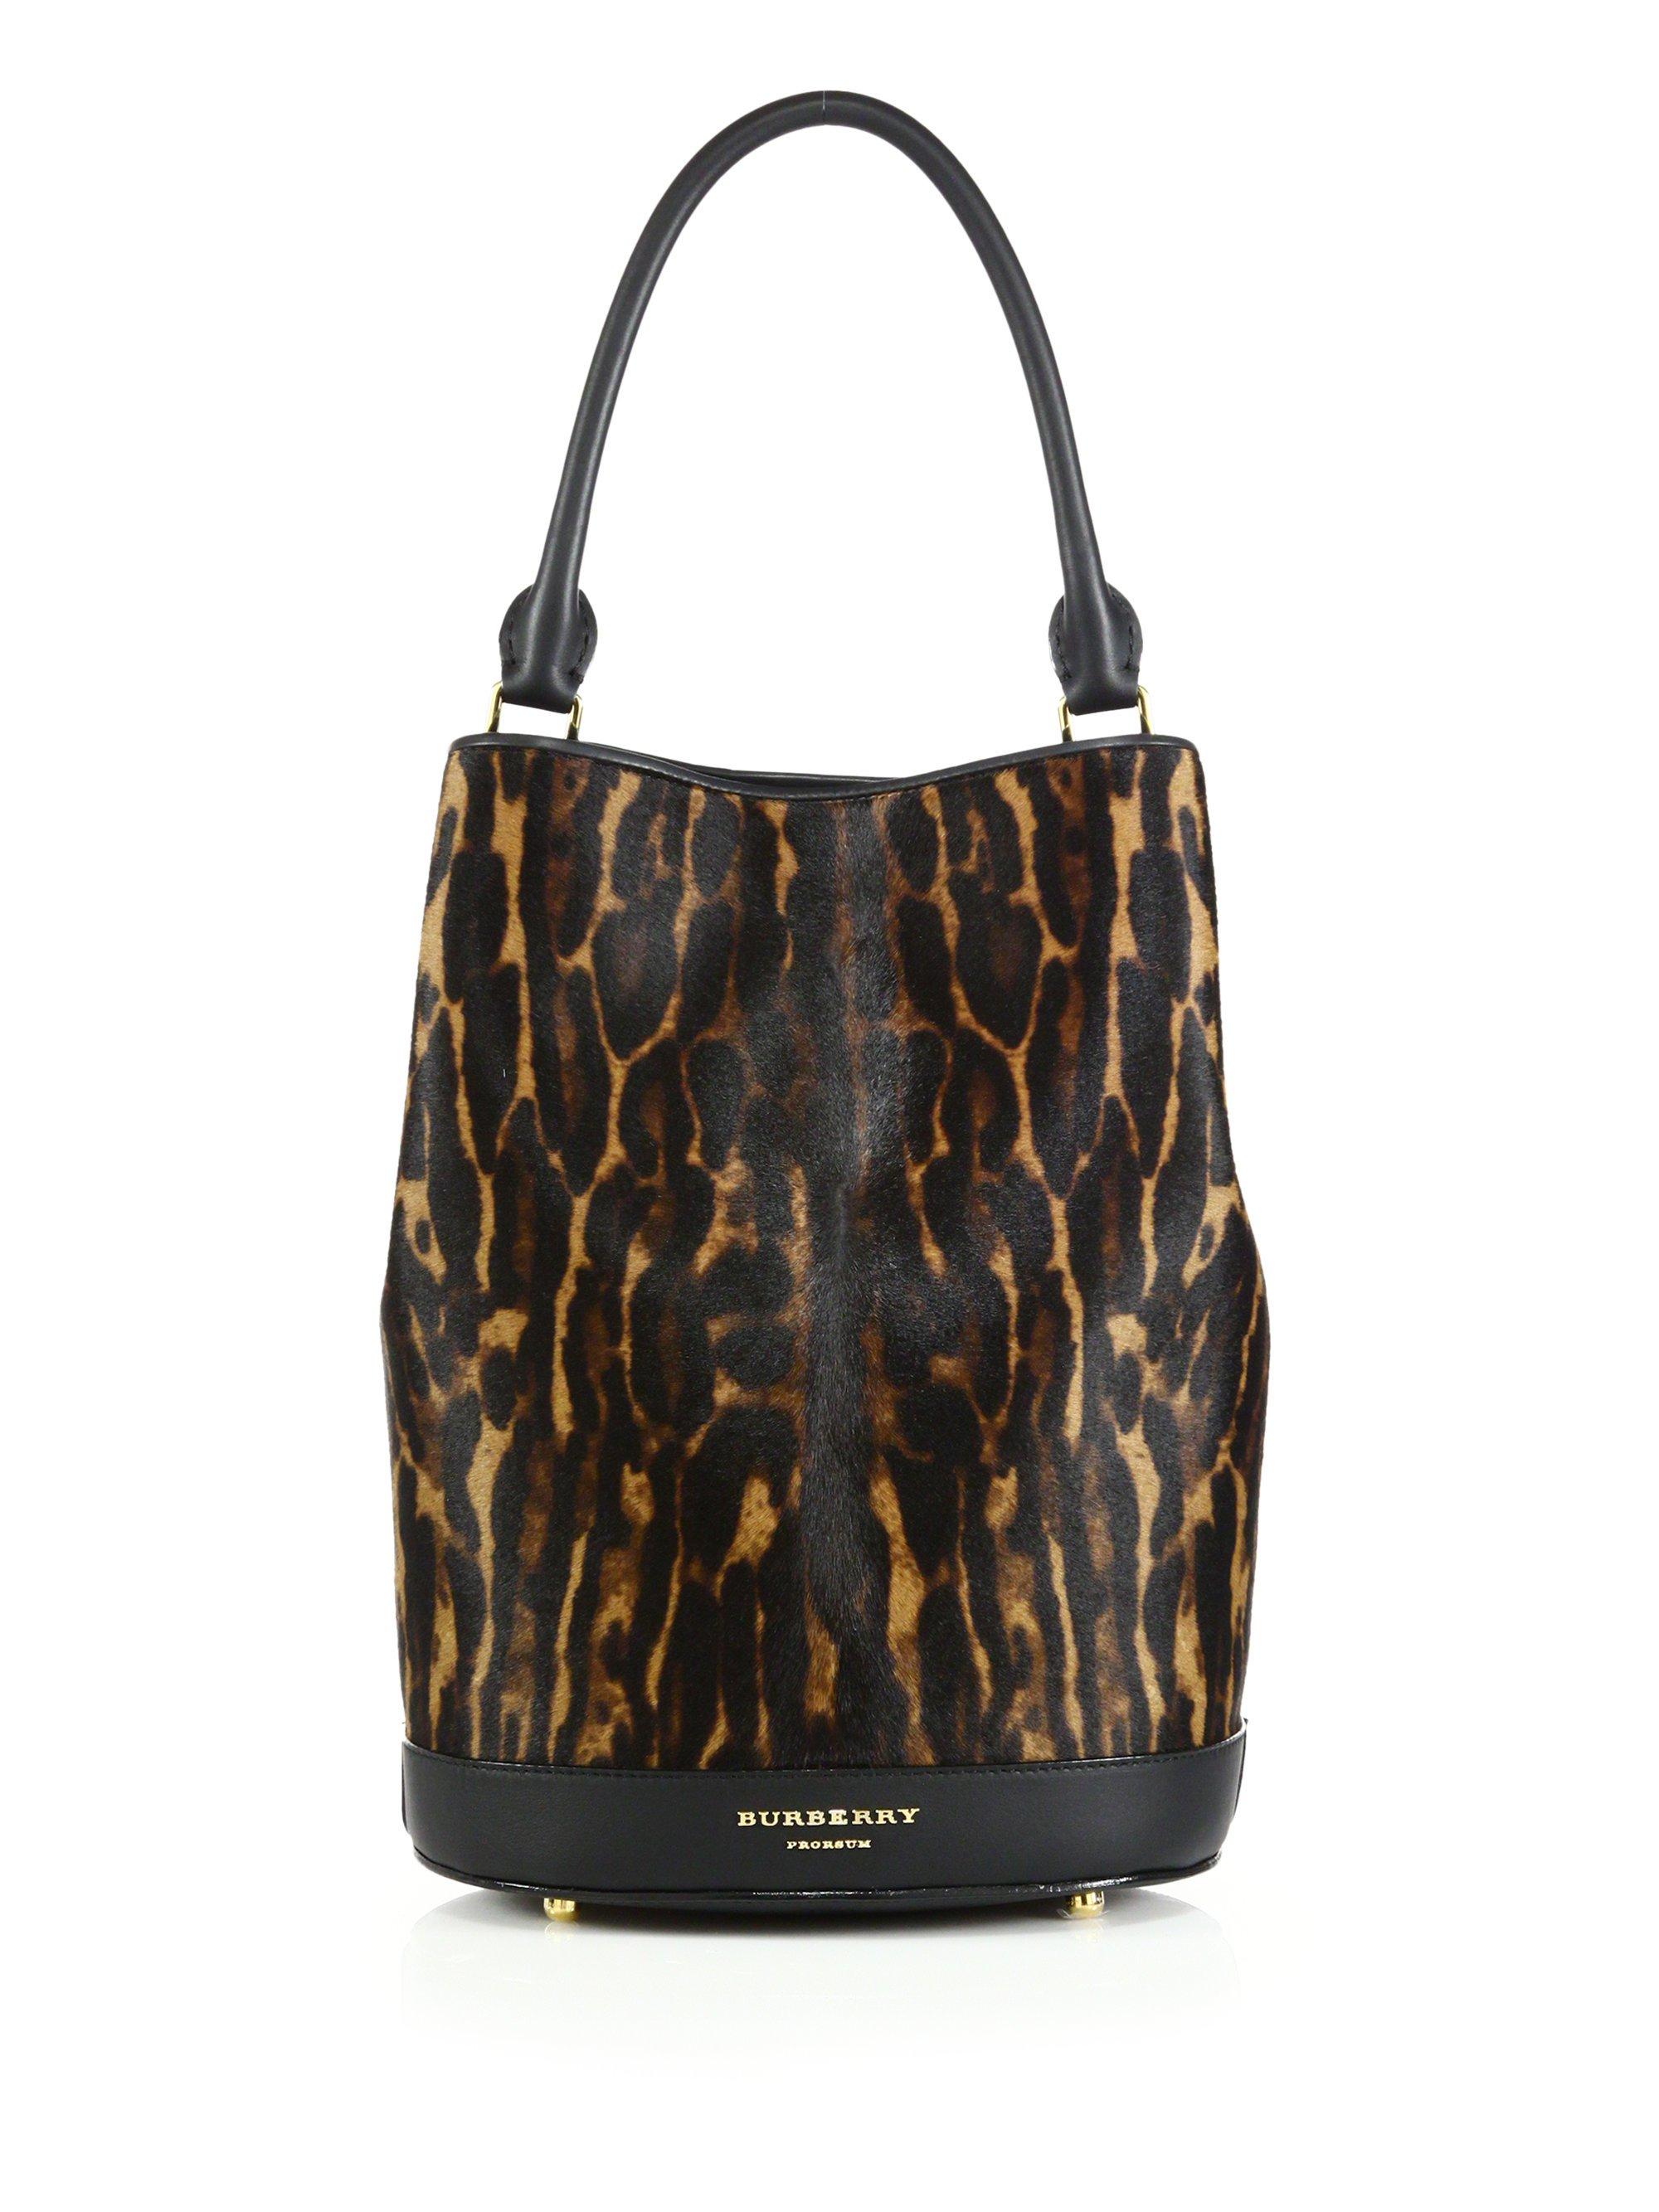 Super Lyst - Burberry Leopard-print Calf Hair Bucket Bag in Brown PK82